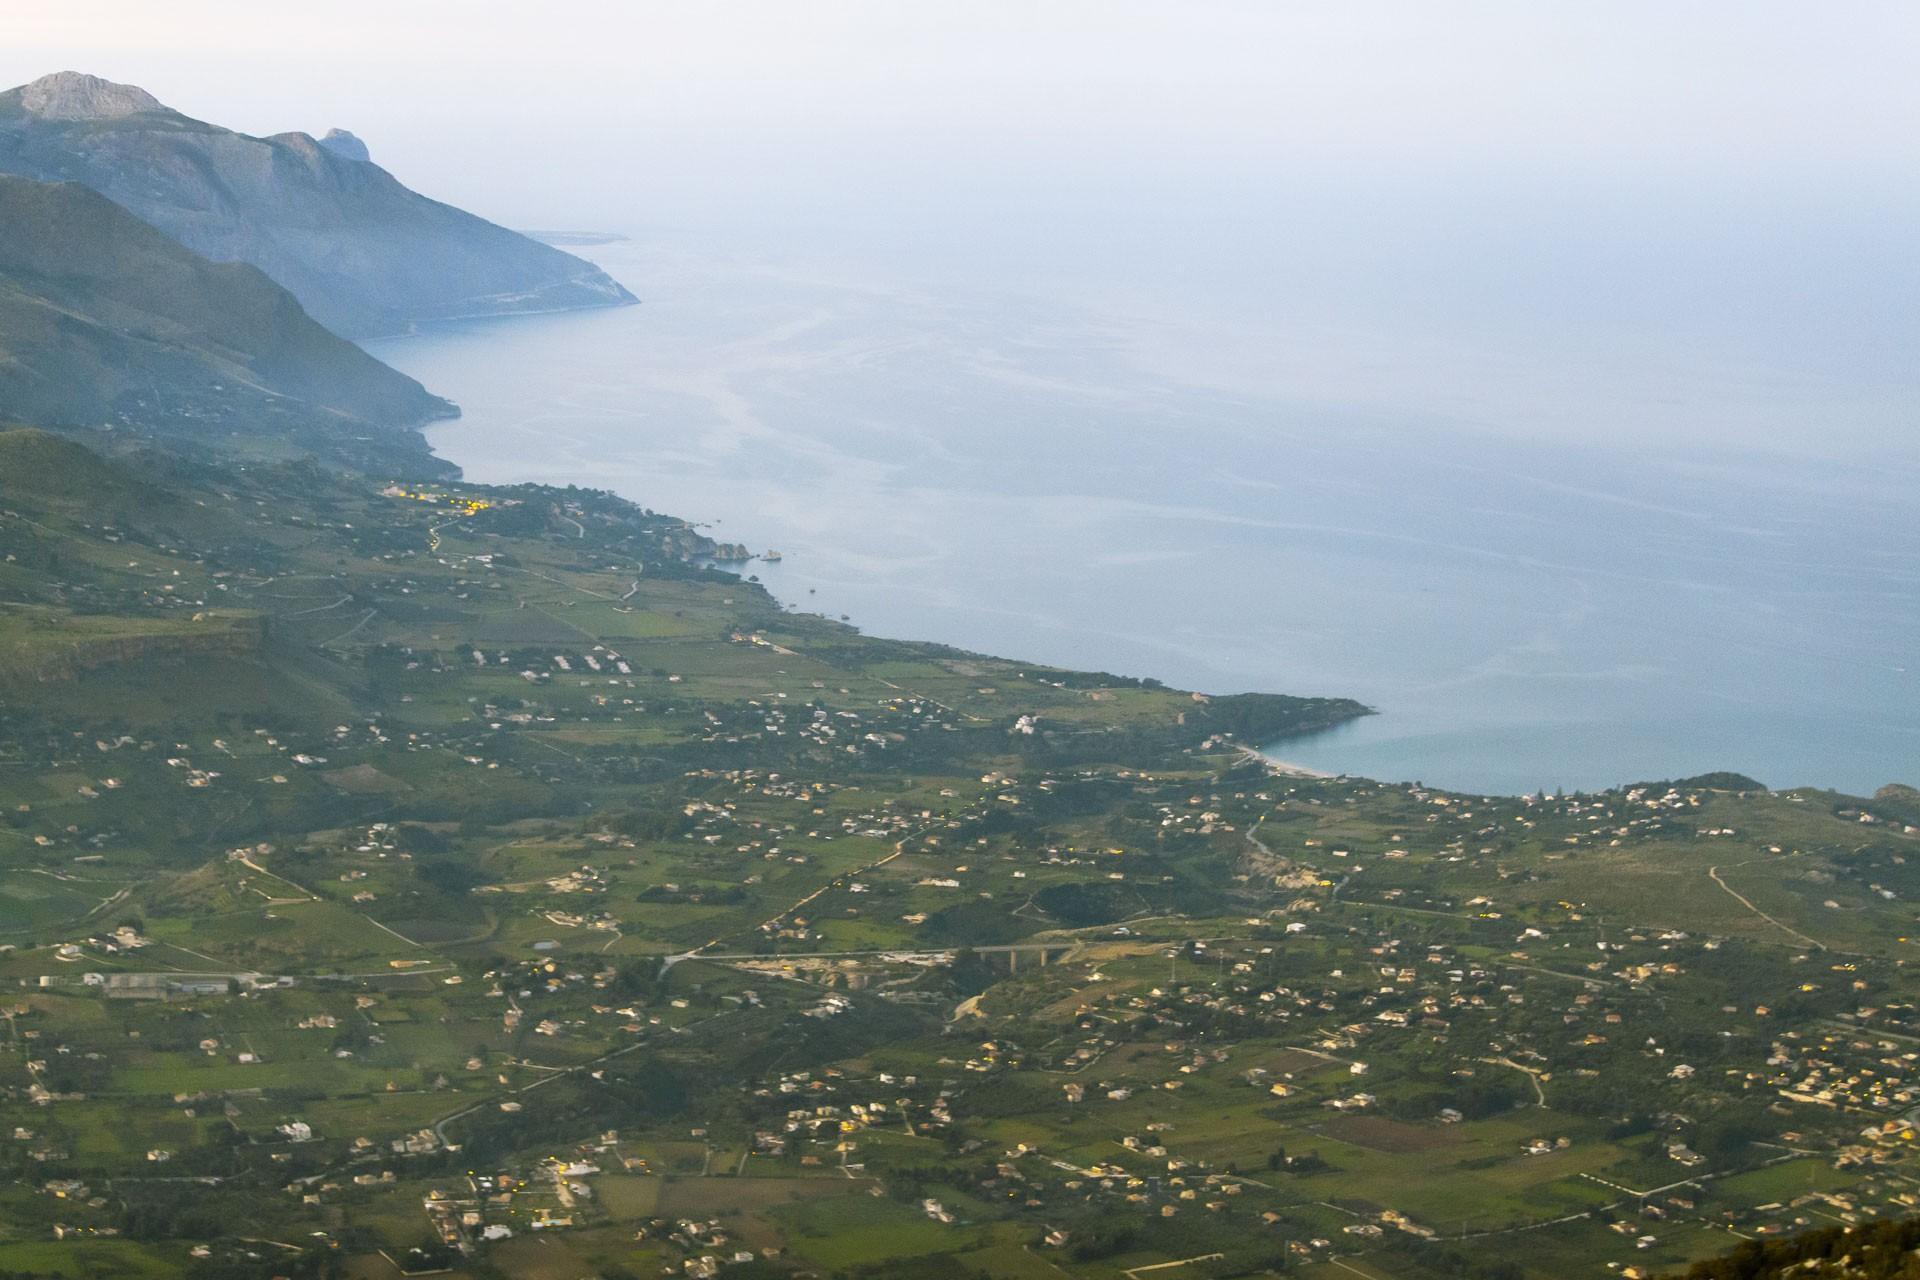 alka-immob-panoramiche-baia-scopello-zingaro